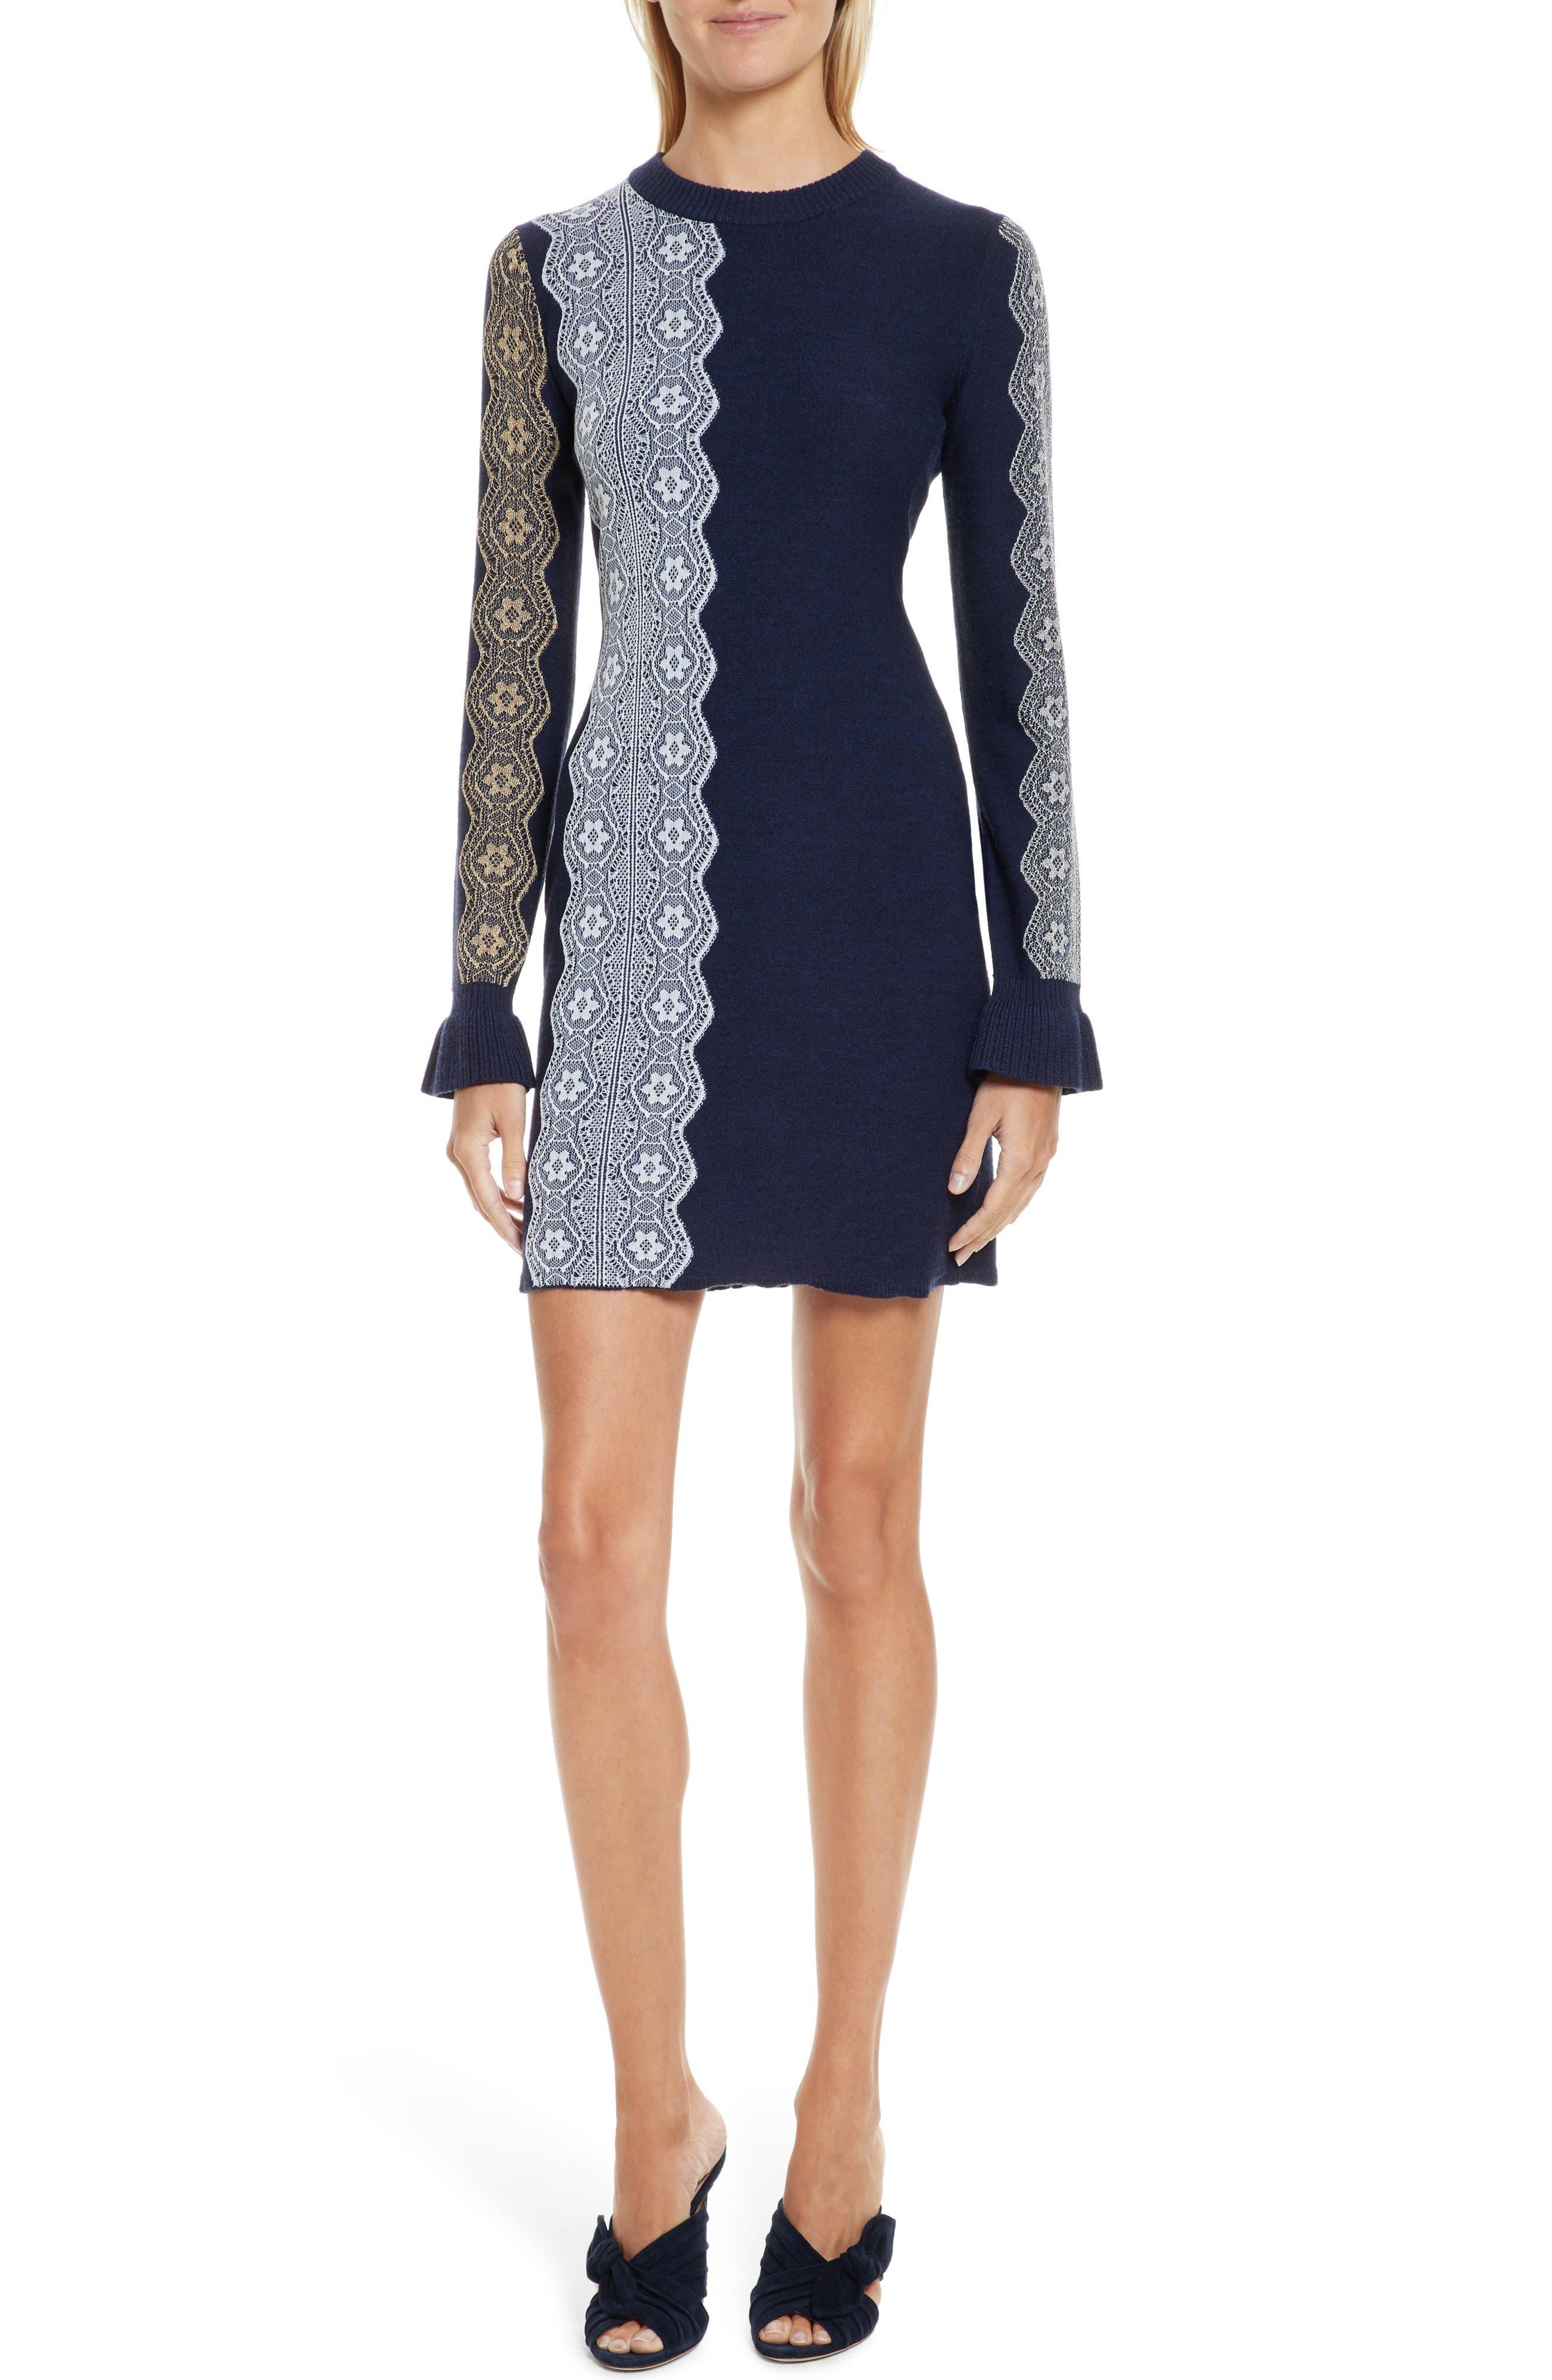 Intarsia Lace Wool Blend Dress,                             Main thumbnail 1, color,                             410